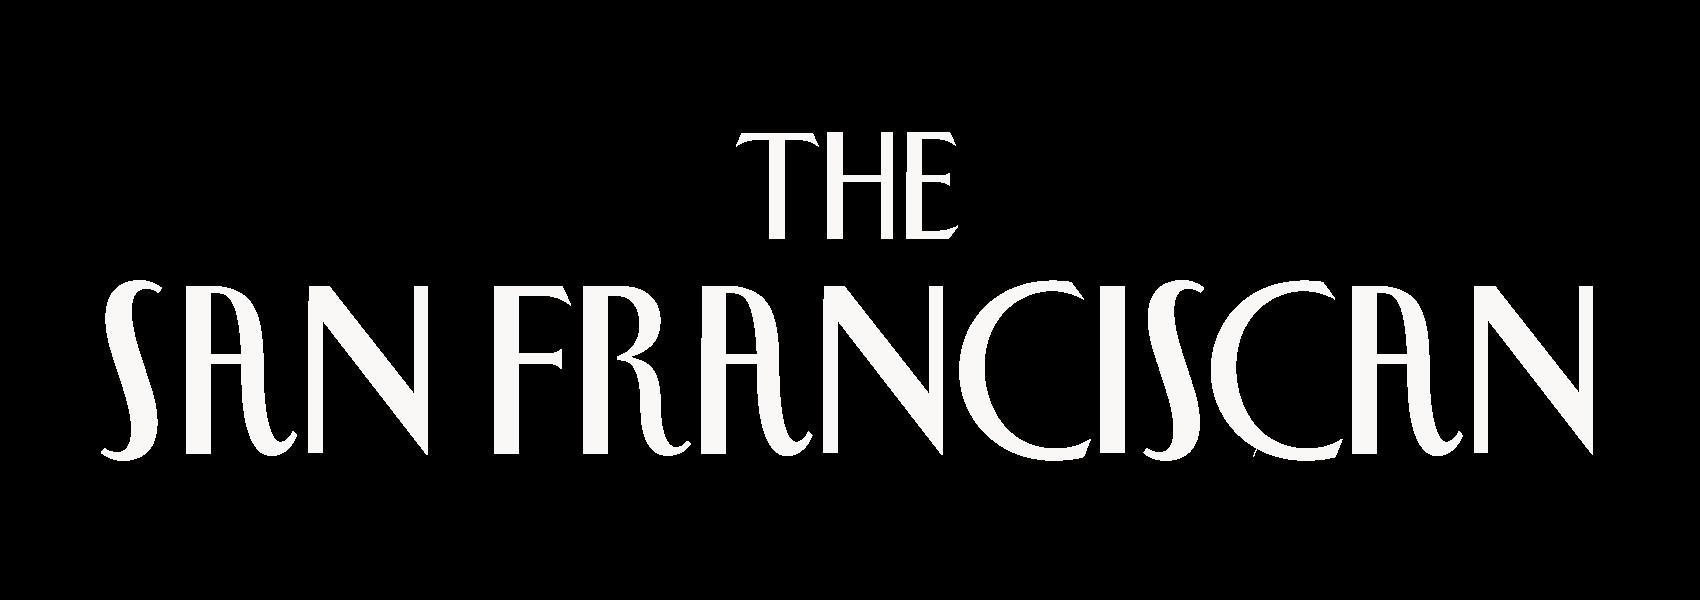 The San Franciscan